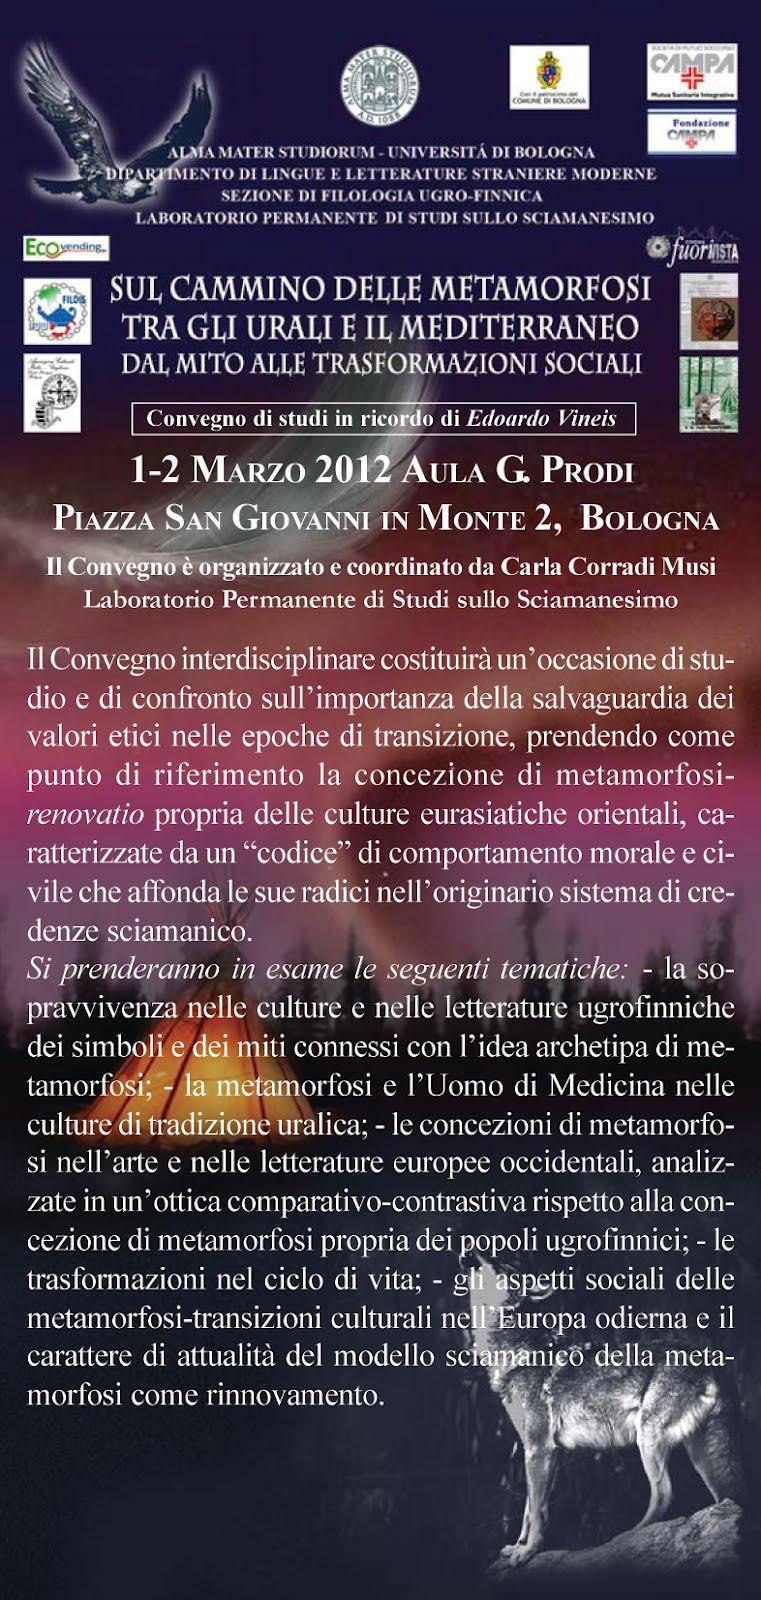 1 - 2 Marzo 2012 Ingresso Libero